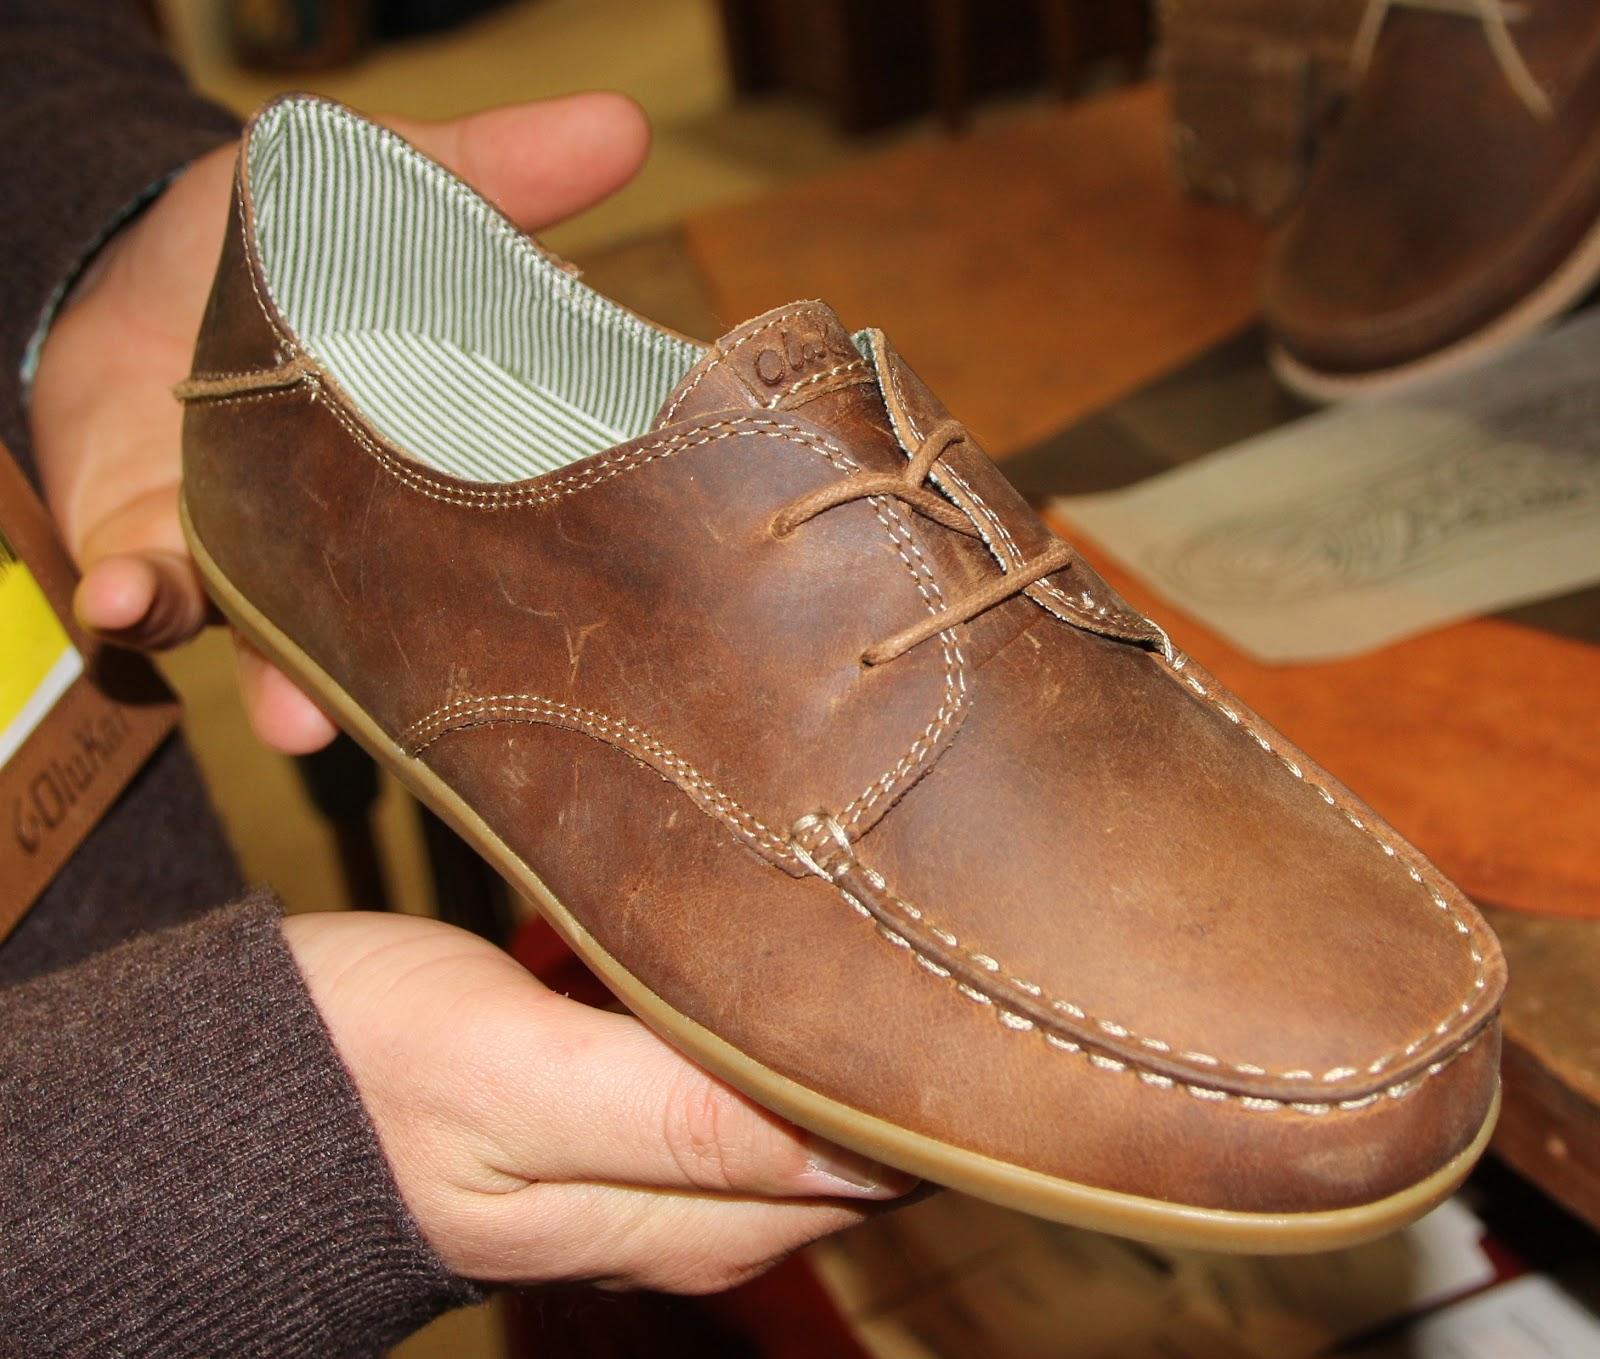 LYRA MAG OluKai MensWomens Footwear Fall 2013 Shoes